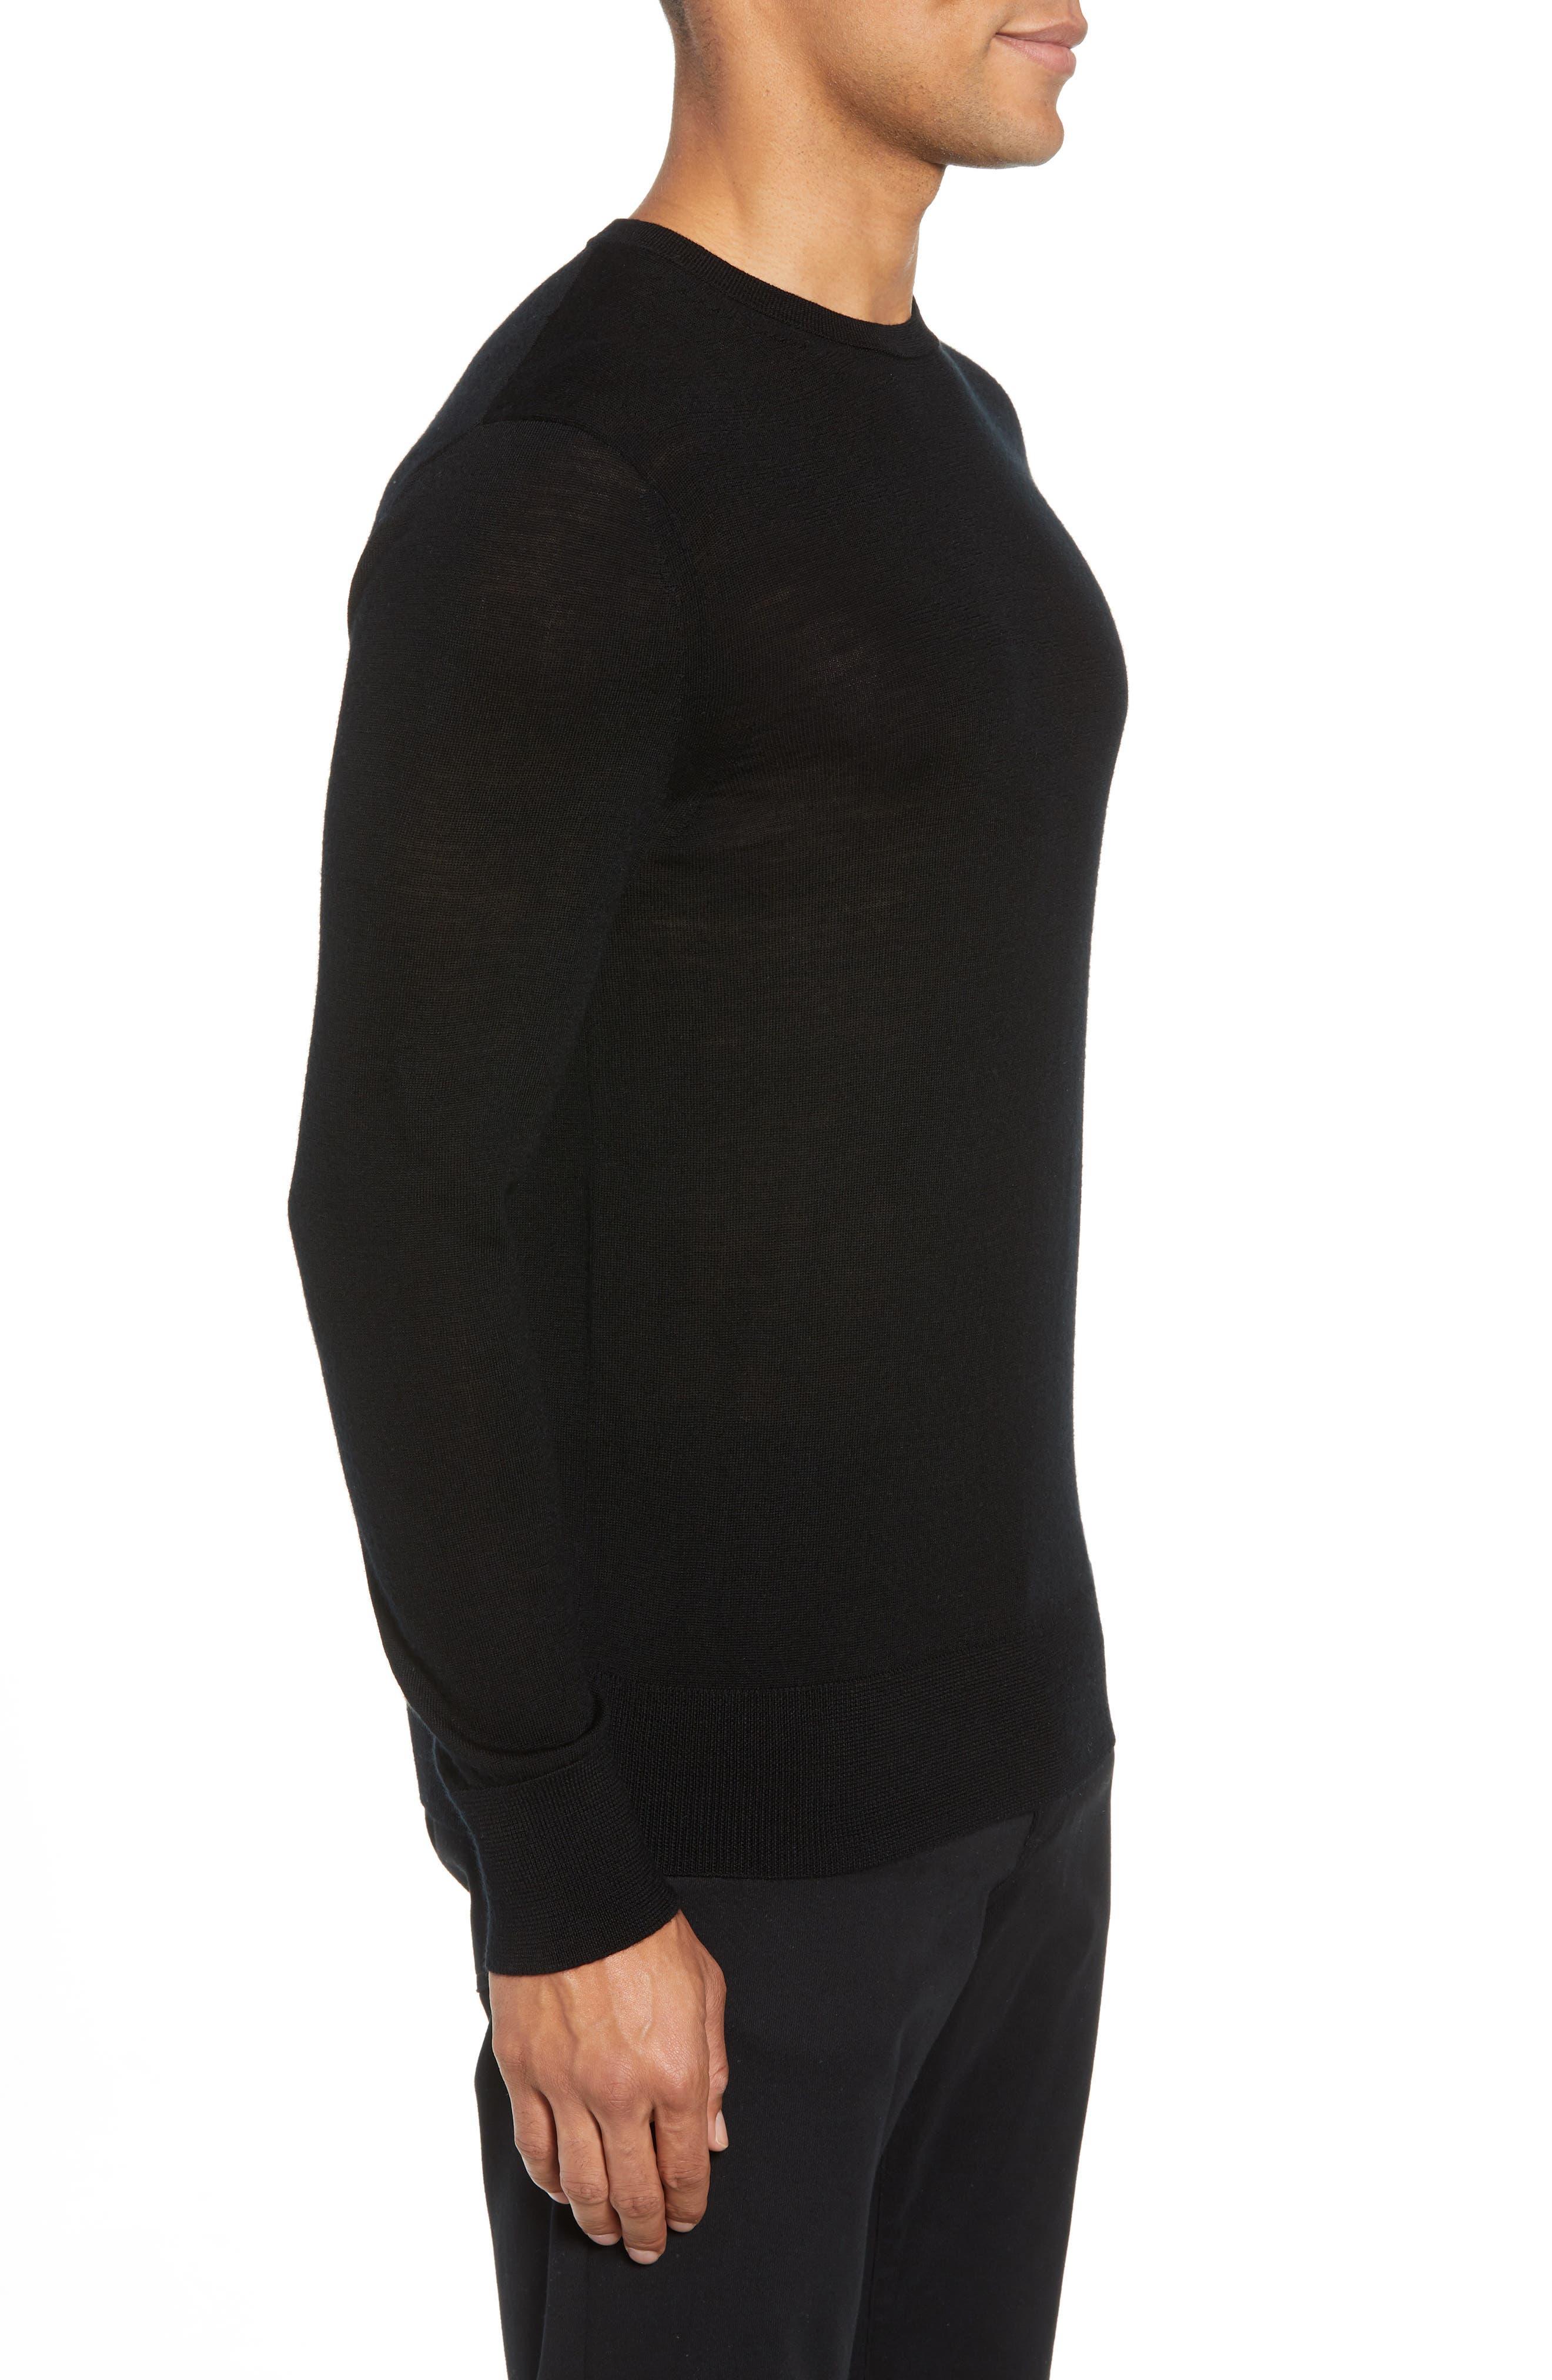 Mode Slim Fit Merino Wool Sweater,                             Alternate thumbnail 3, color,                             Black